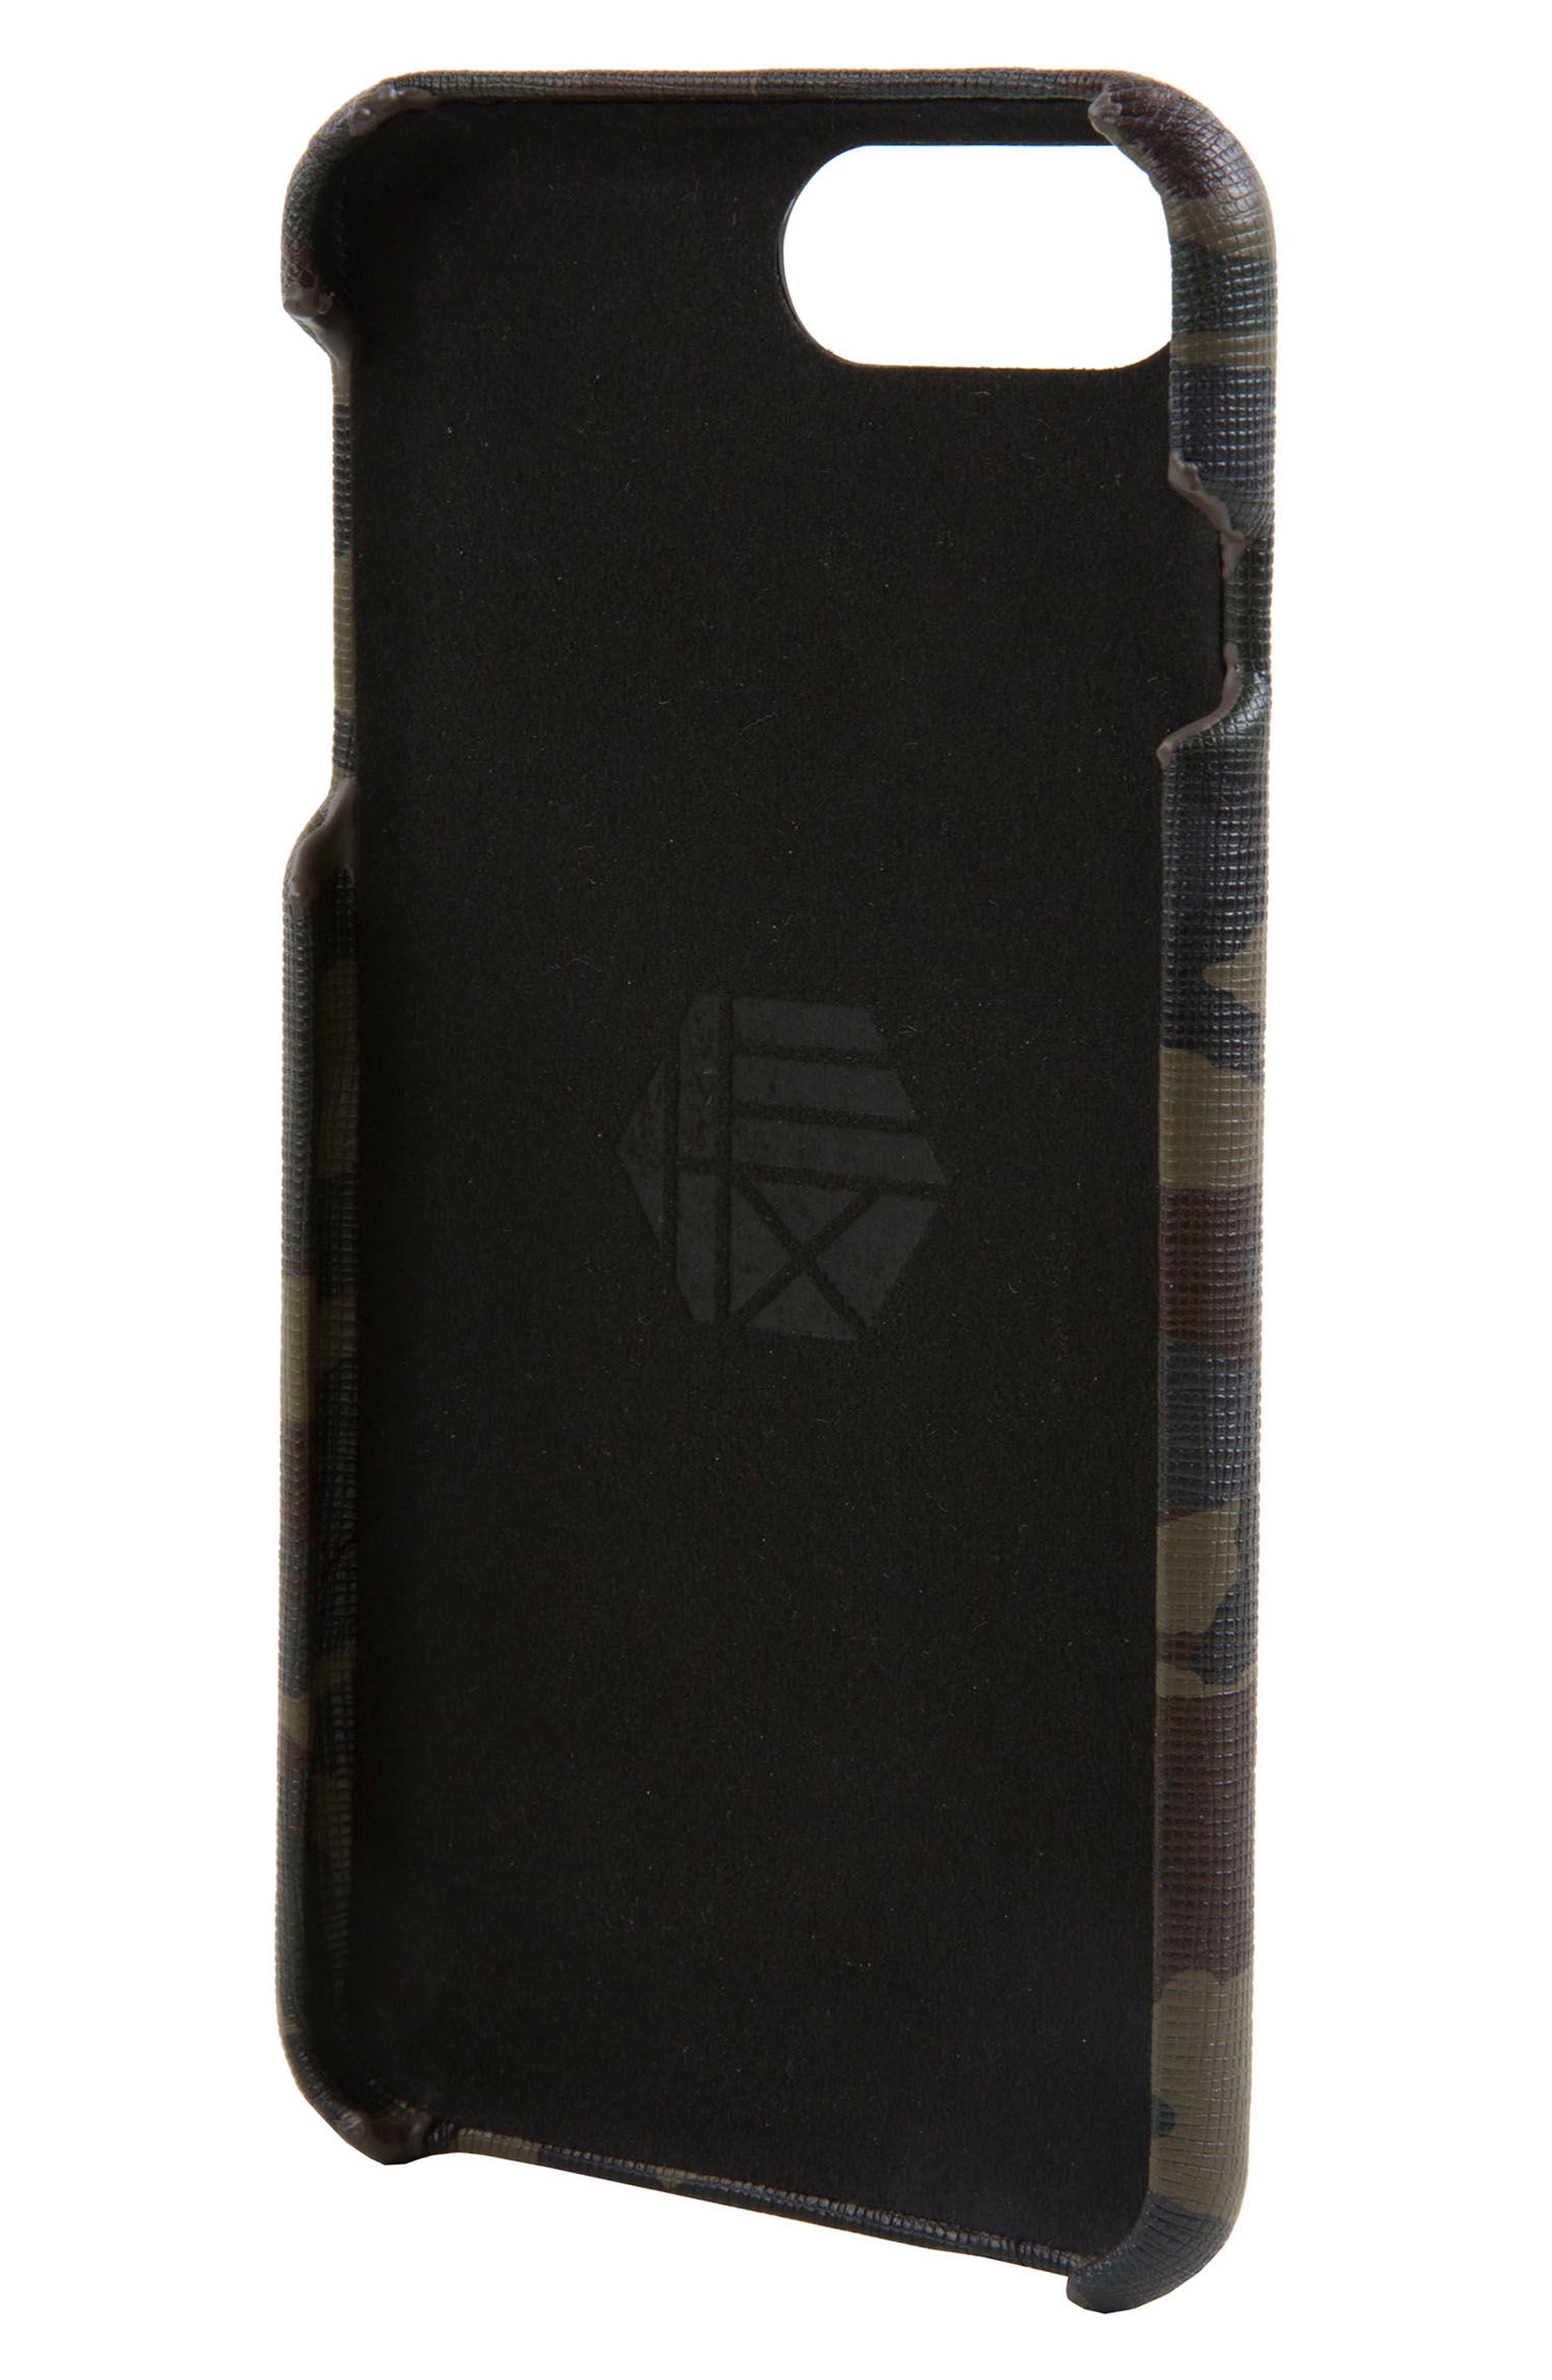 Solo iPhone 6/6s/7/8 Plus Wallet Case,                             Alternate thumbnail 2, color,                             Camo/ Reflective